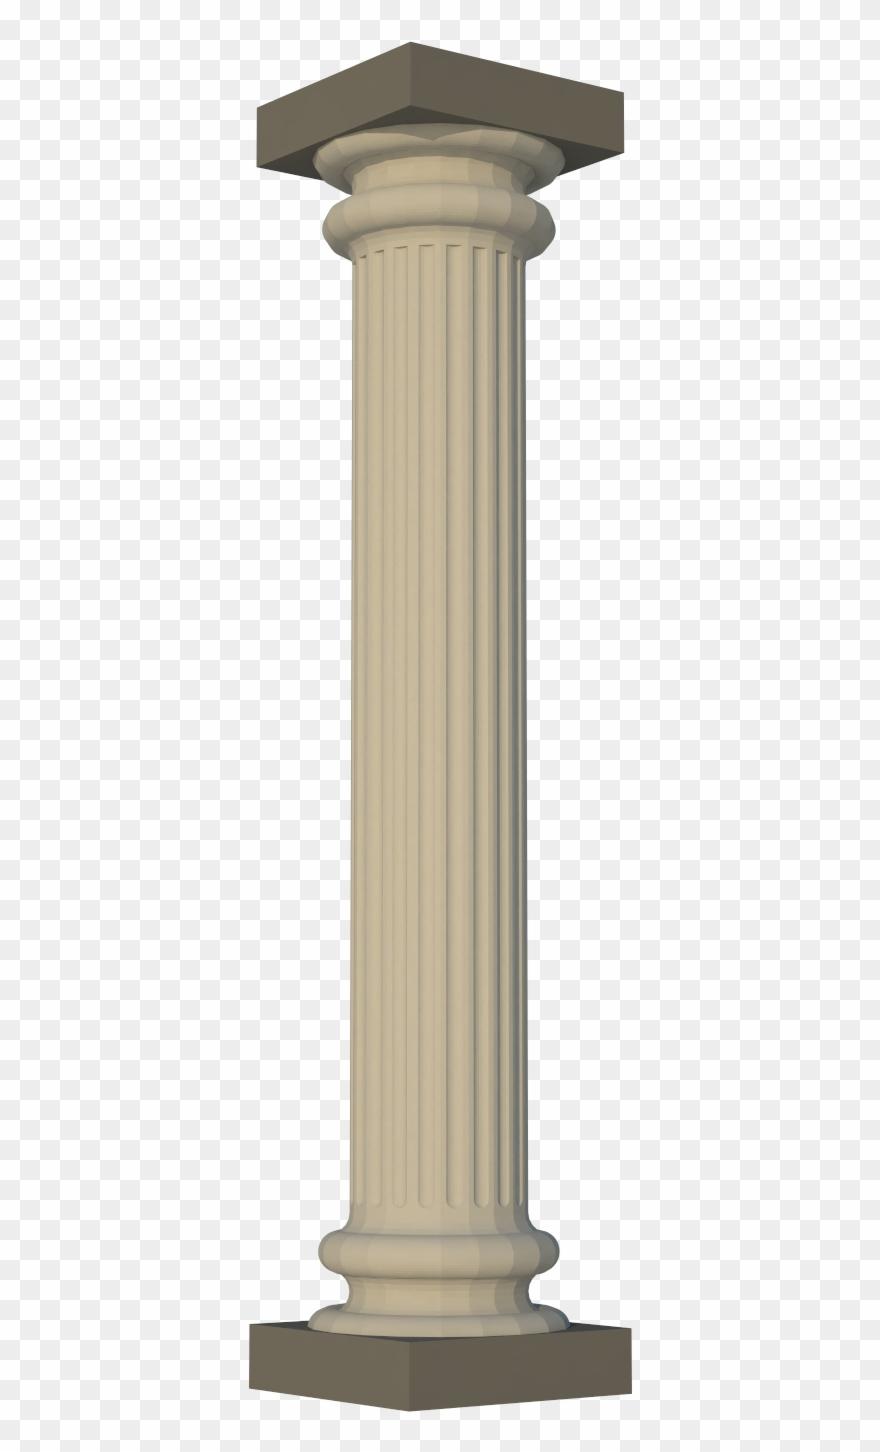 Greek Pillar Dustynus Thingiverse Png Fancy Pillar.